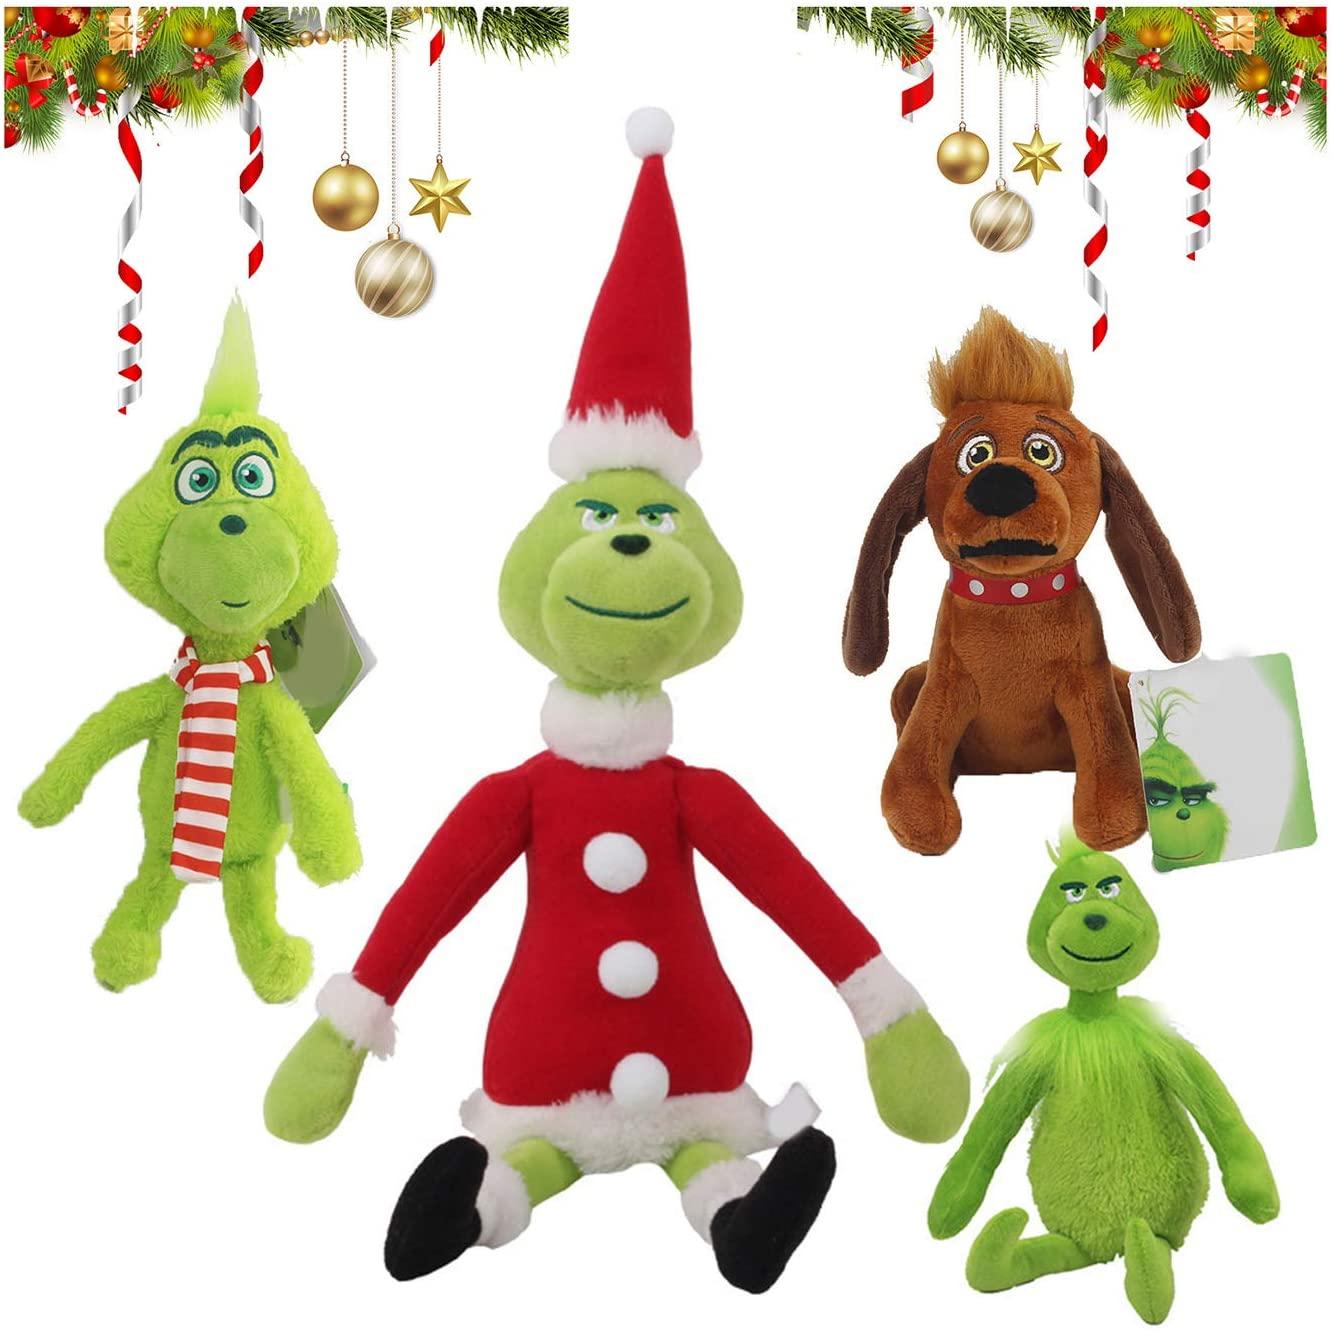 The Grinch stuffed toy animal Christmas